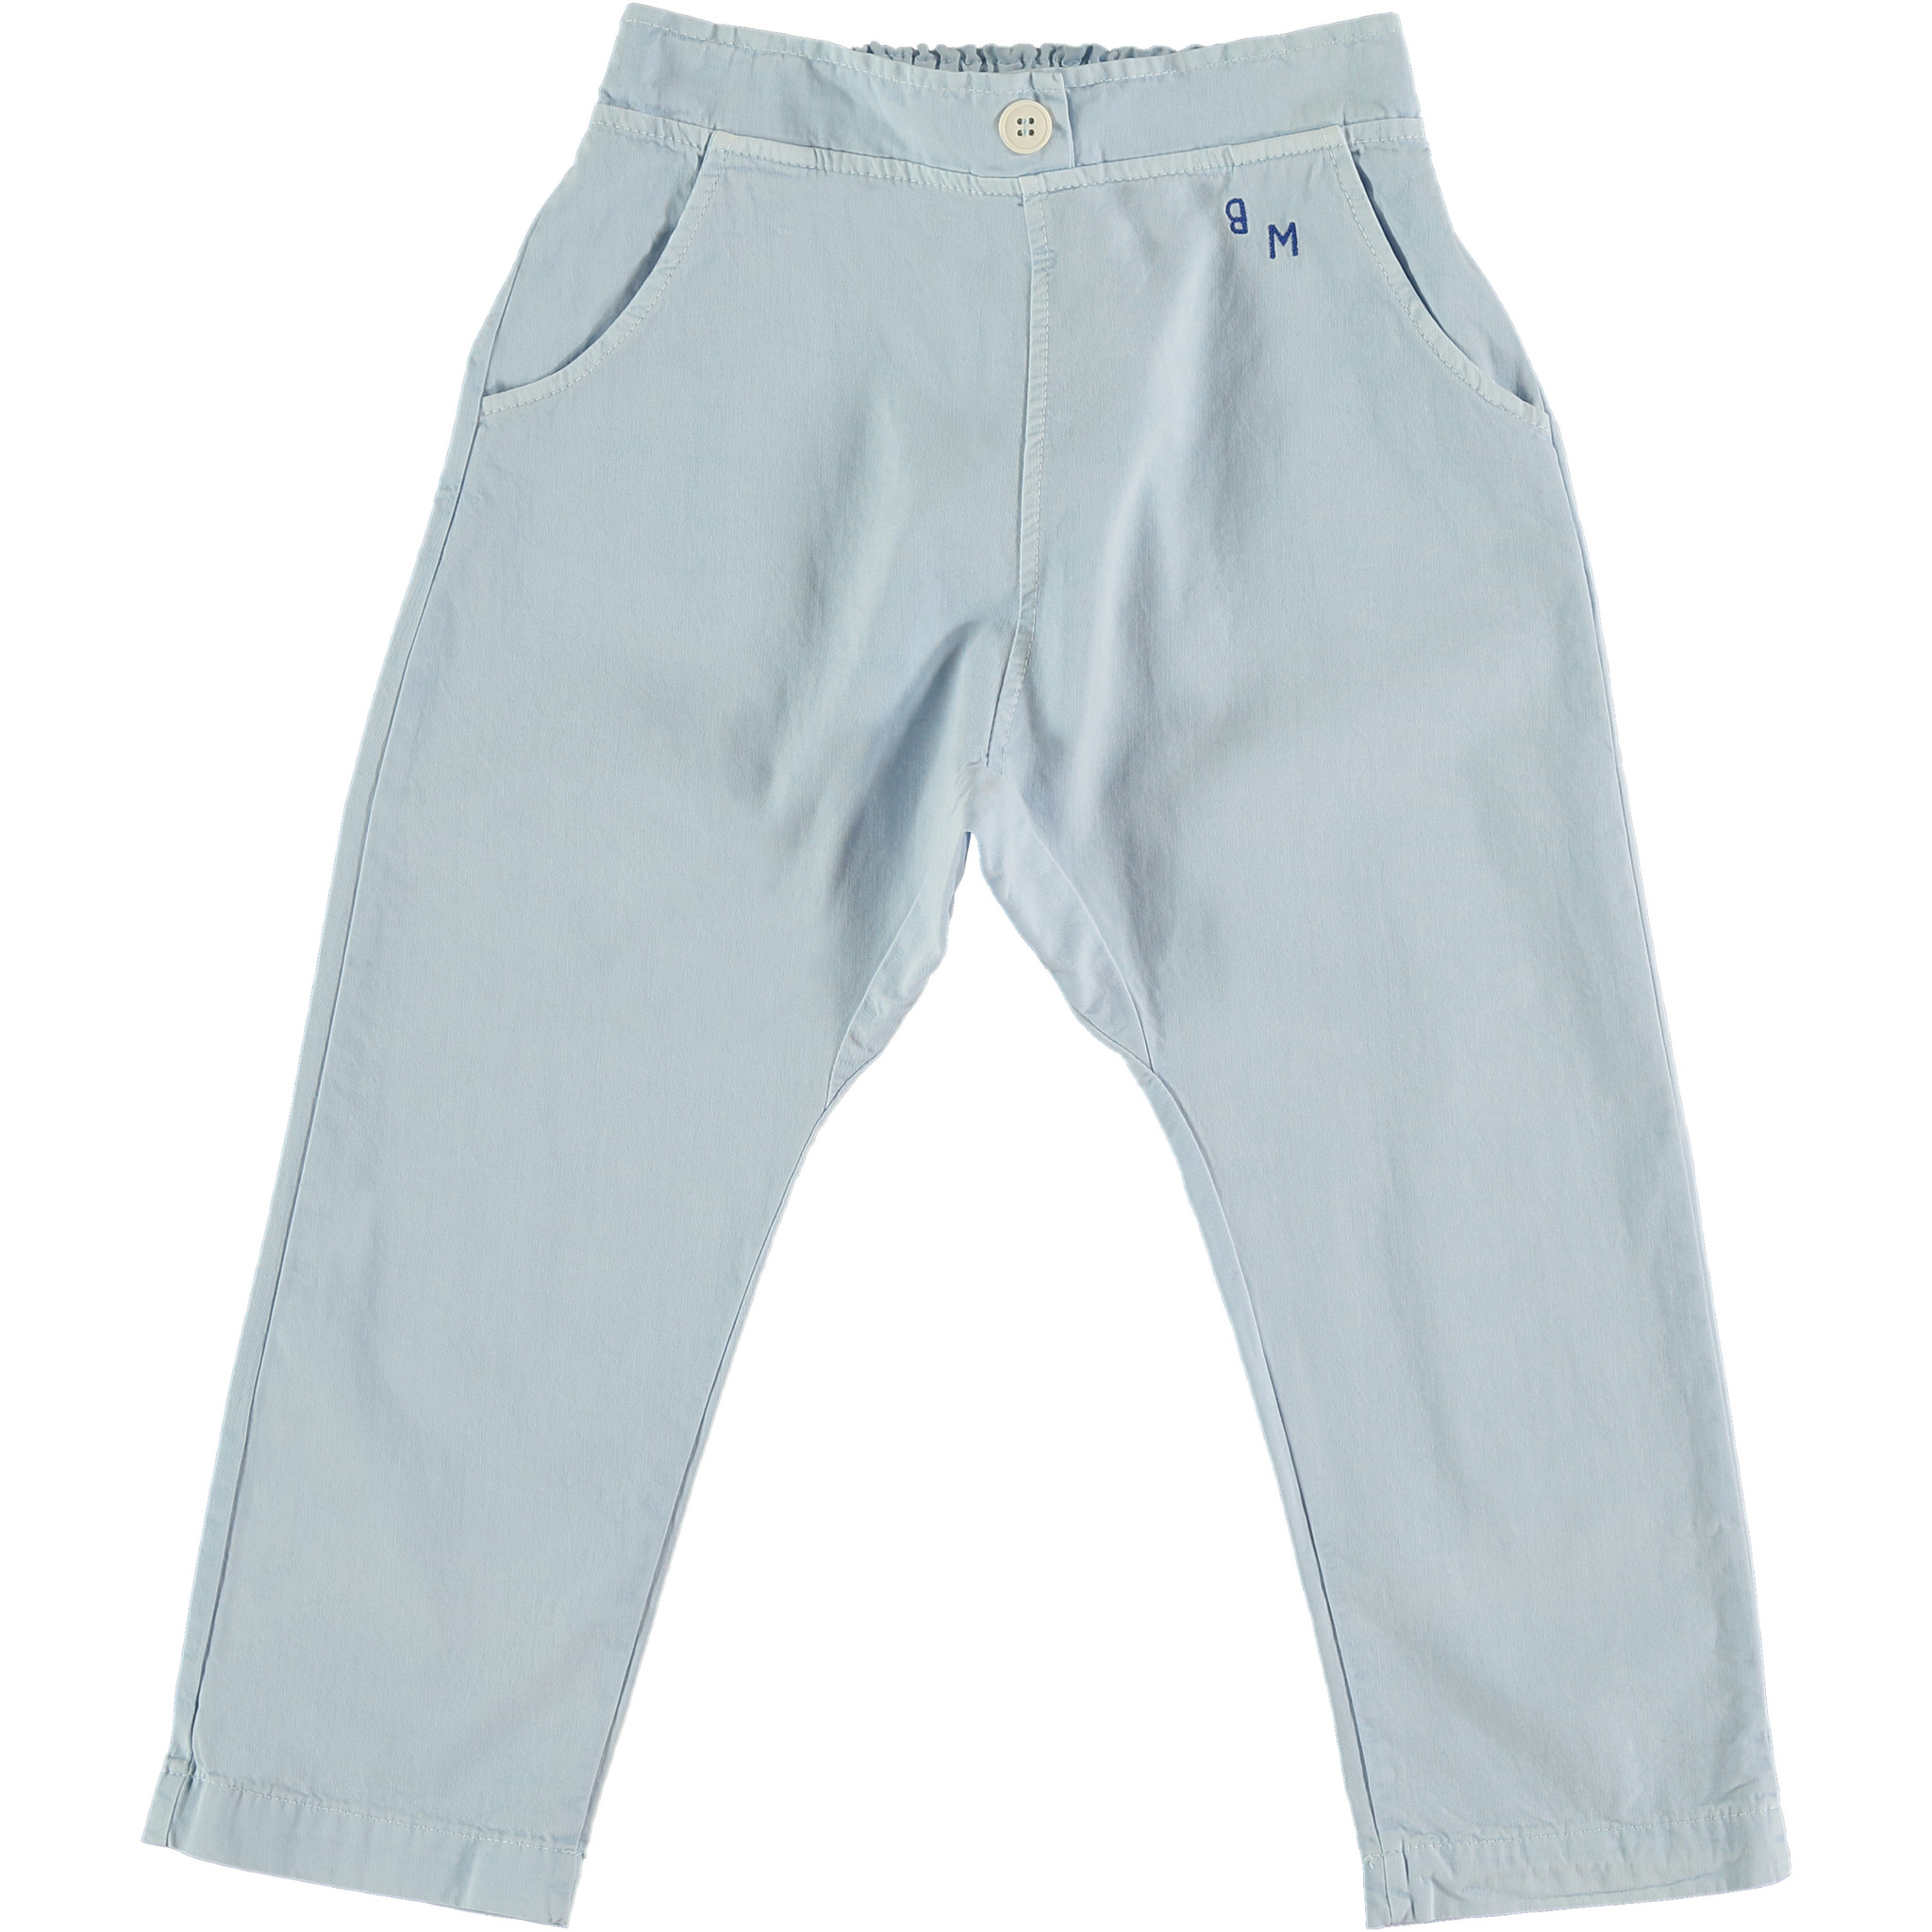 Baggy trousers bm - Light Blue-1